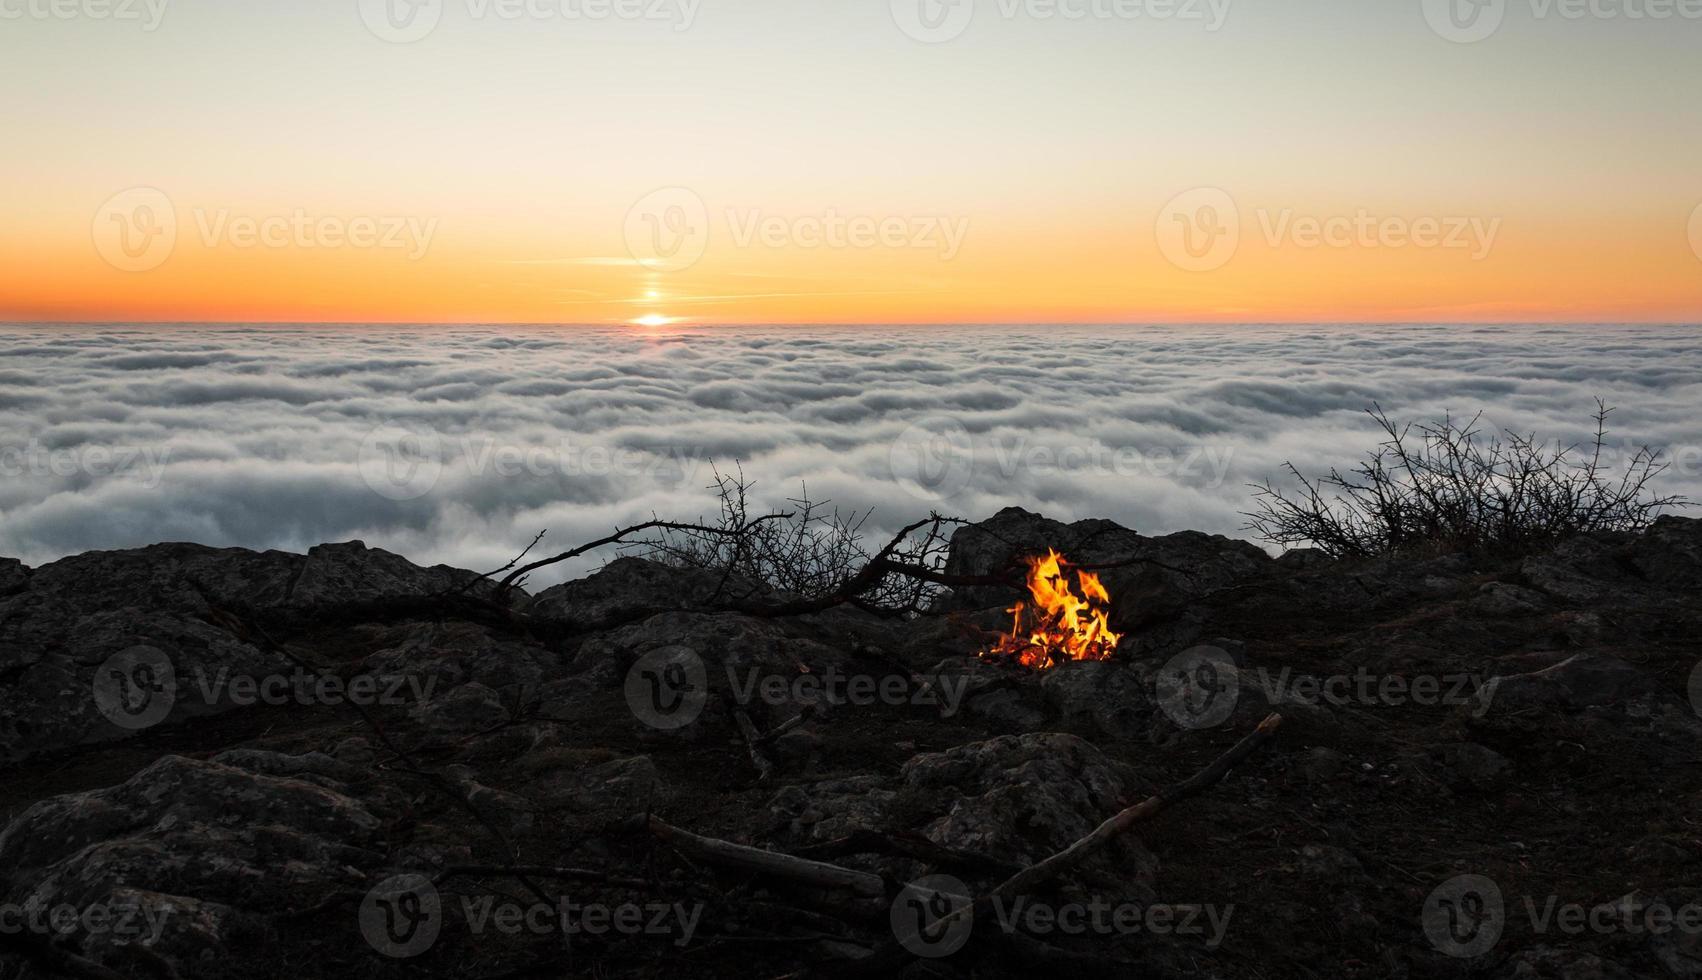 Sunrise fire photo